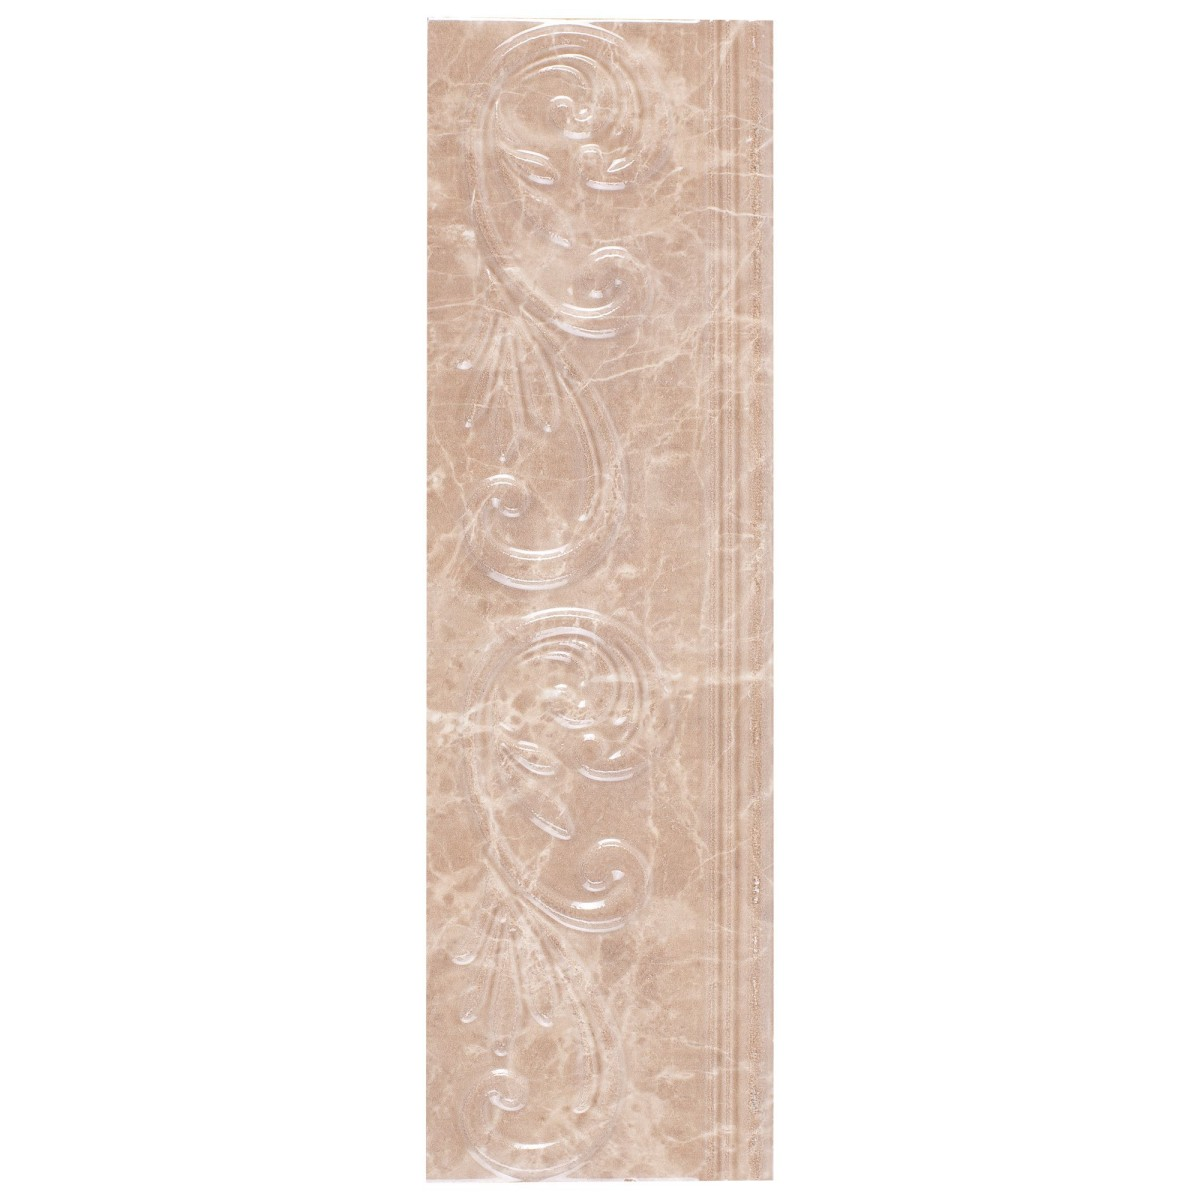 Бордюр Golden Tile «Lorenzo Modern» 30х9 см цвет темно-бежевый